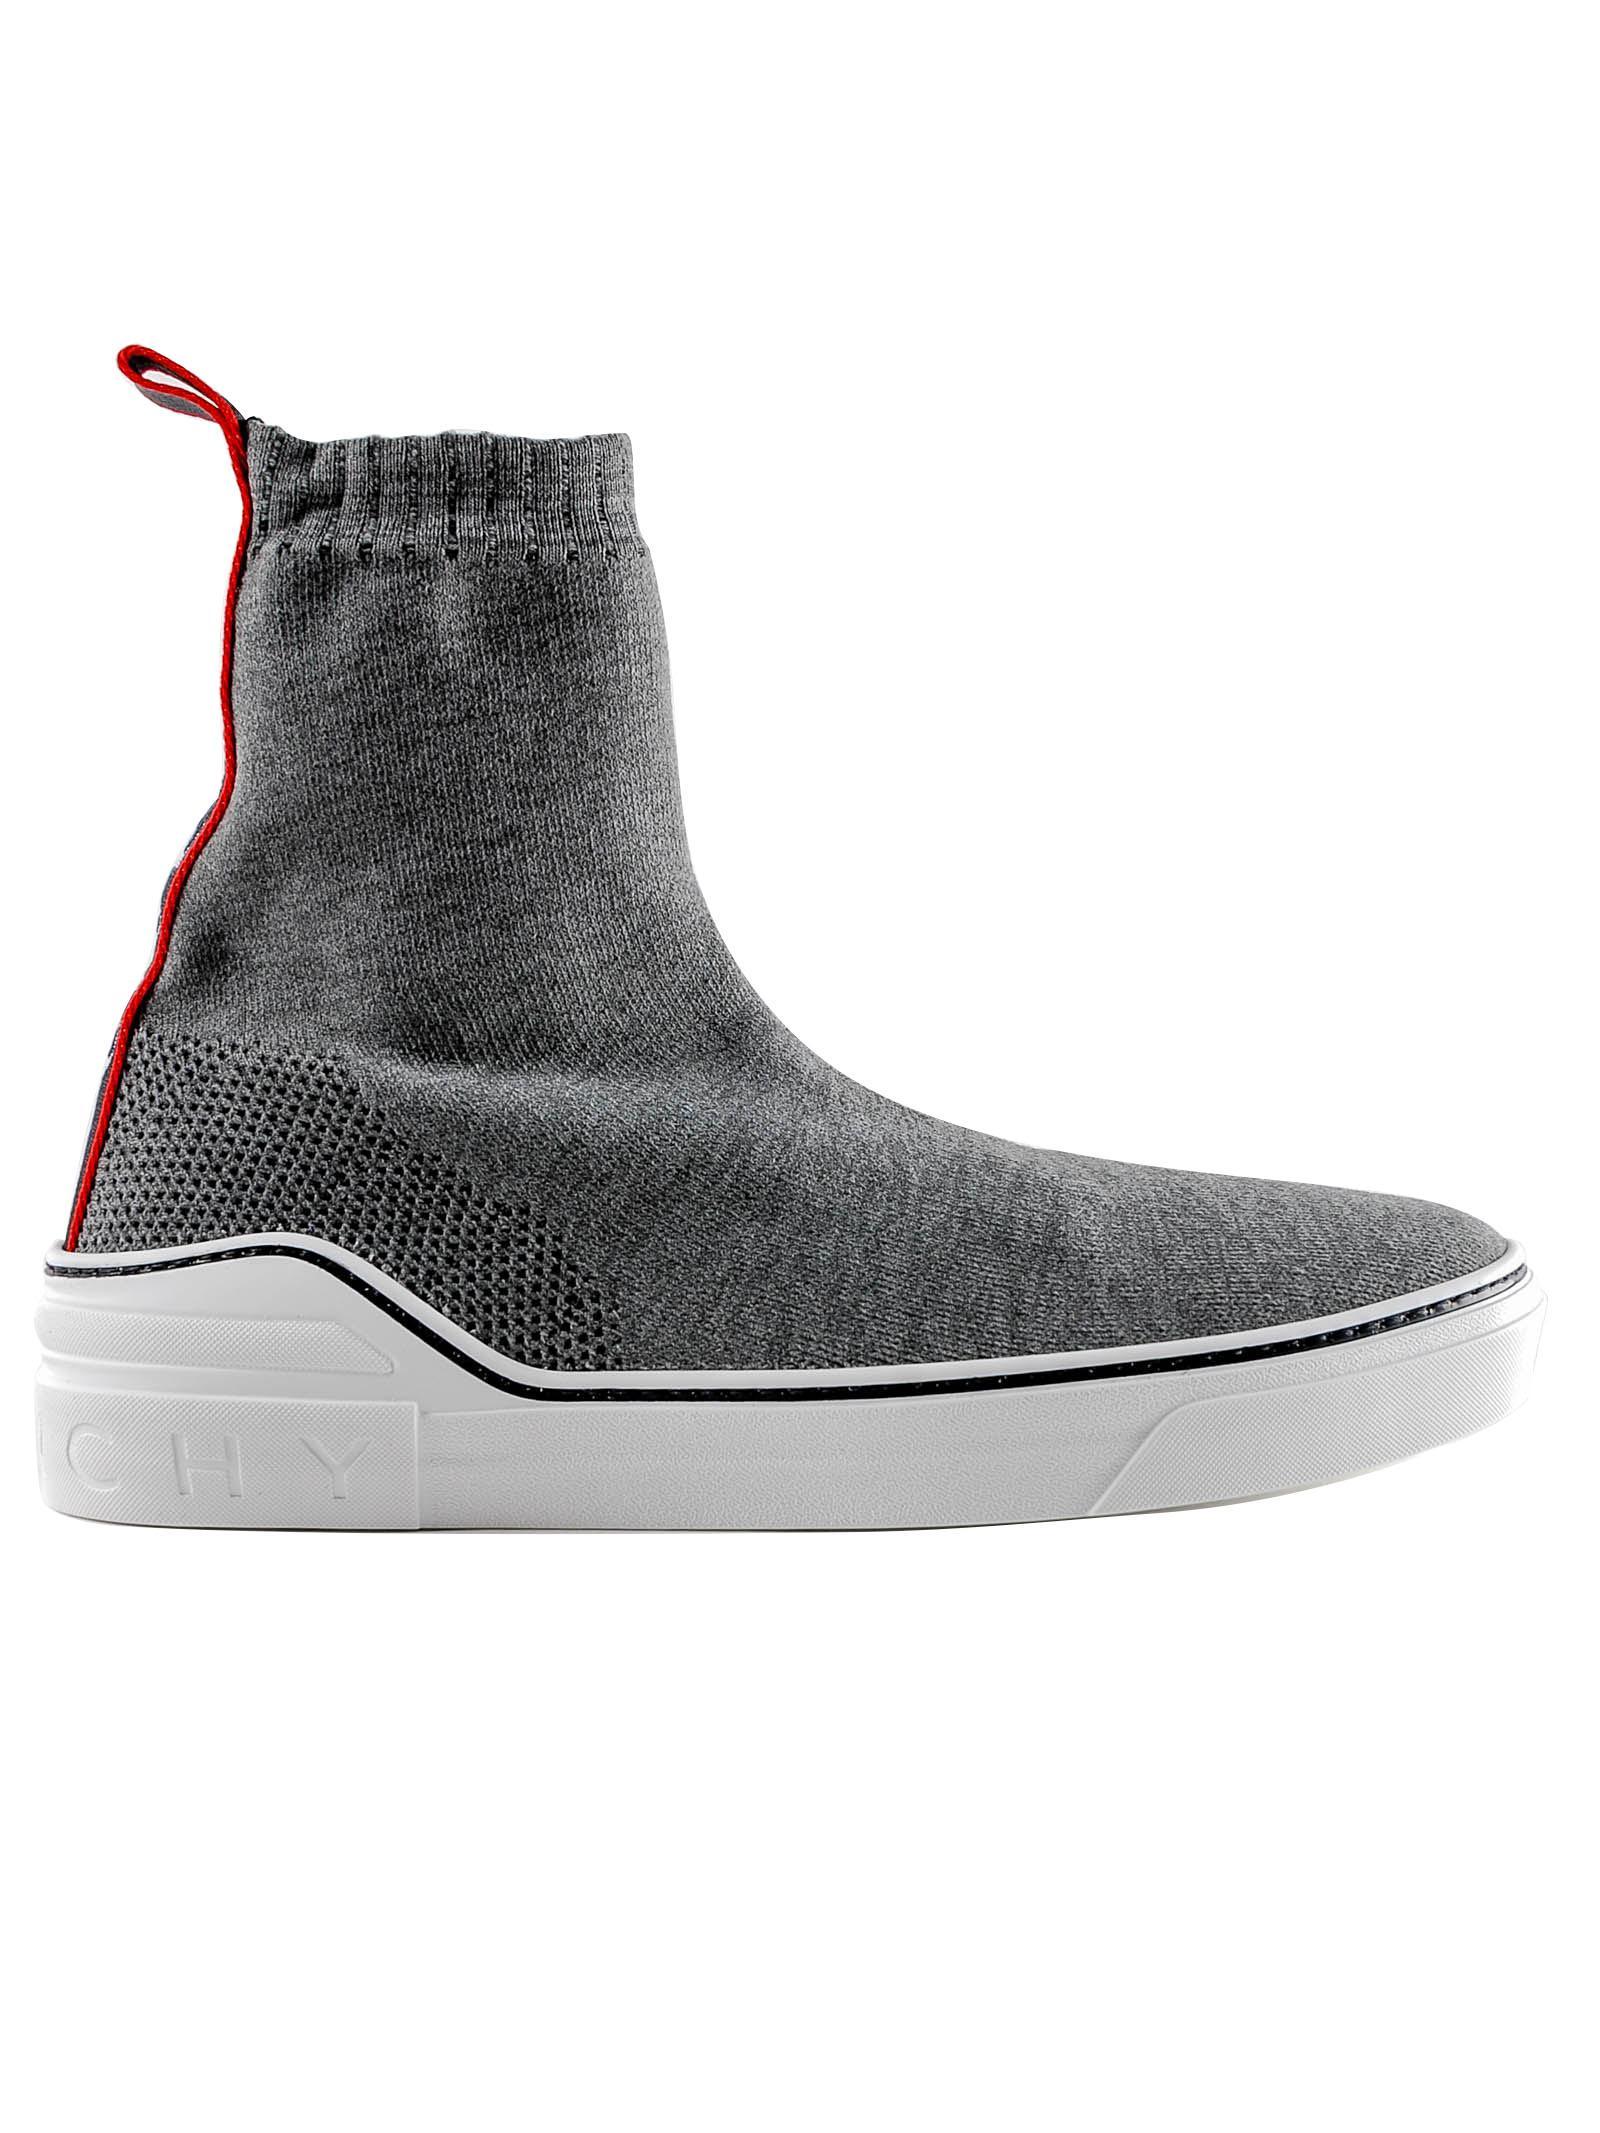 55af0b2521a64 Lyst - Givenchy George V Mid Sock Sneaker in Gray for Men